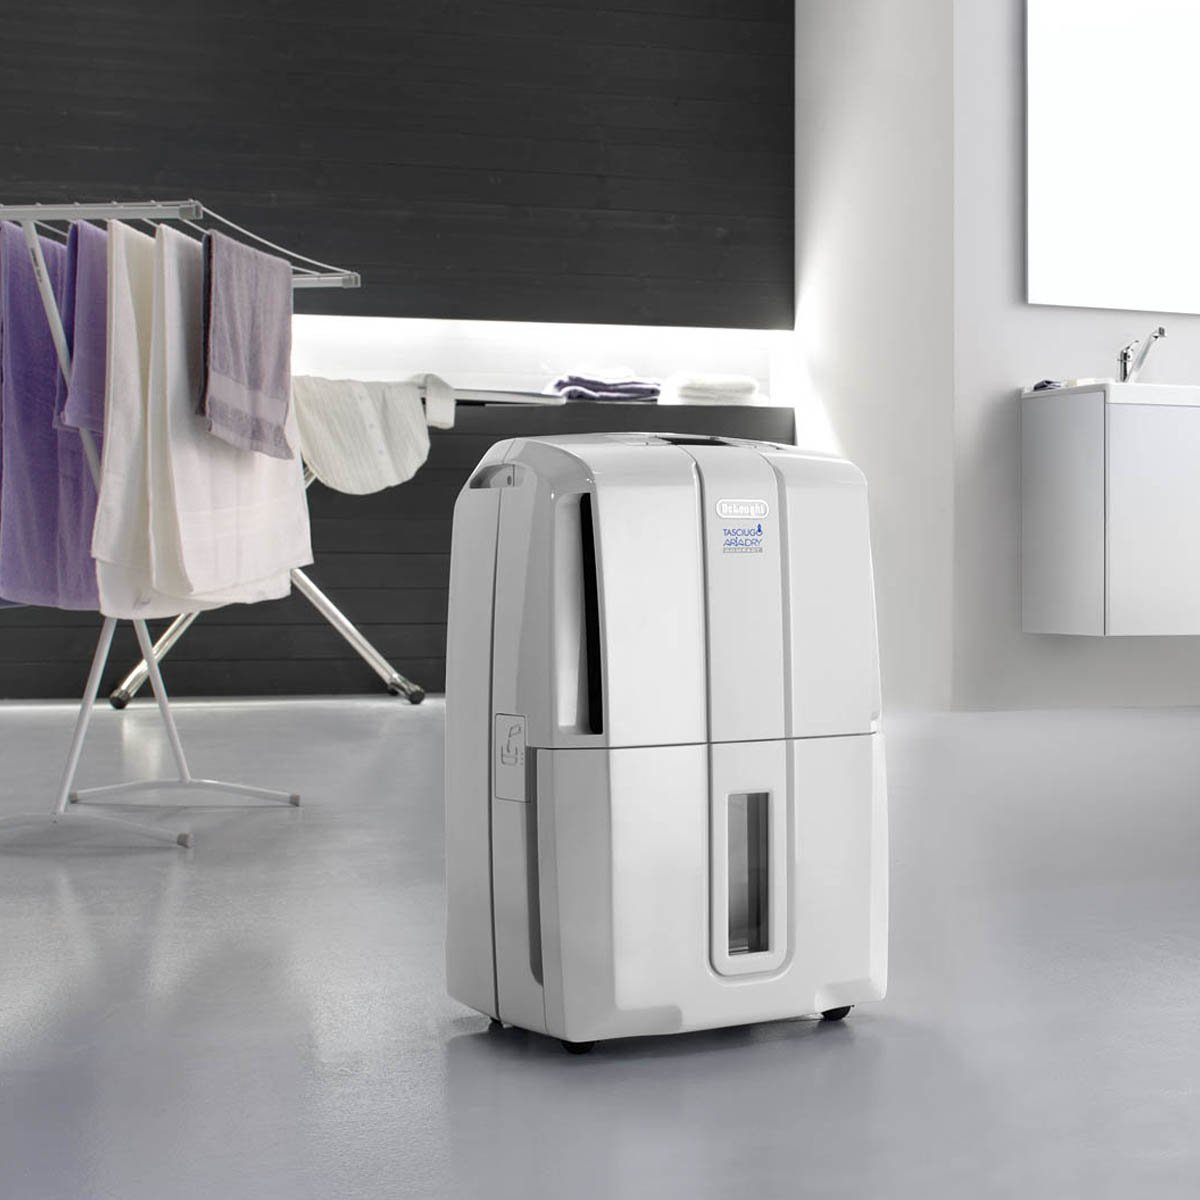 Delonghi Dds30combi 30l Ariadry Compact Dehumidifier Appliances Online Mitsubishi Thermostat 3 0l